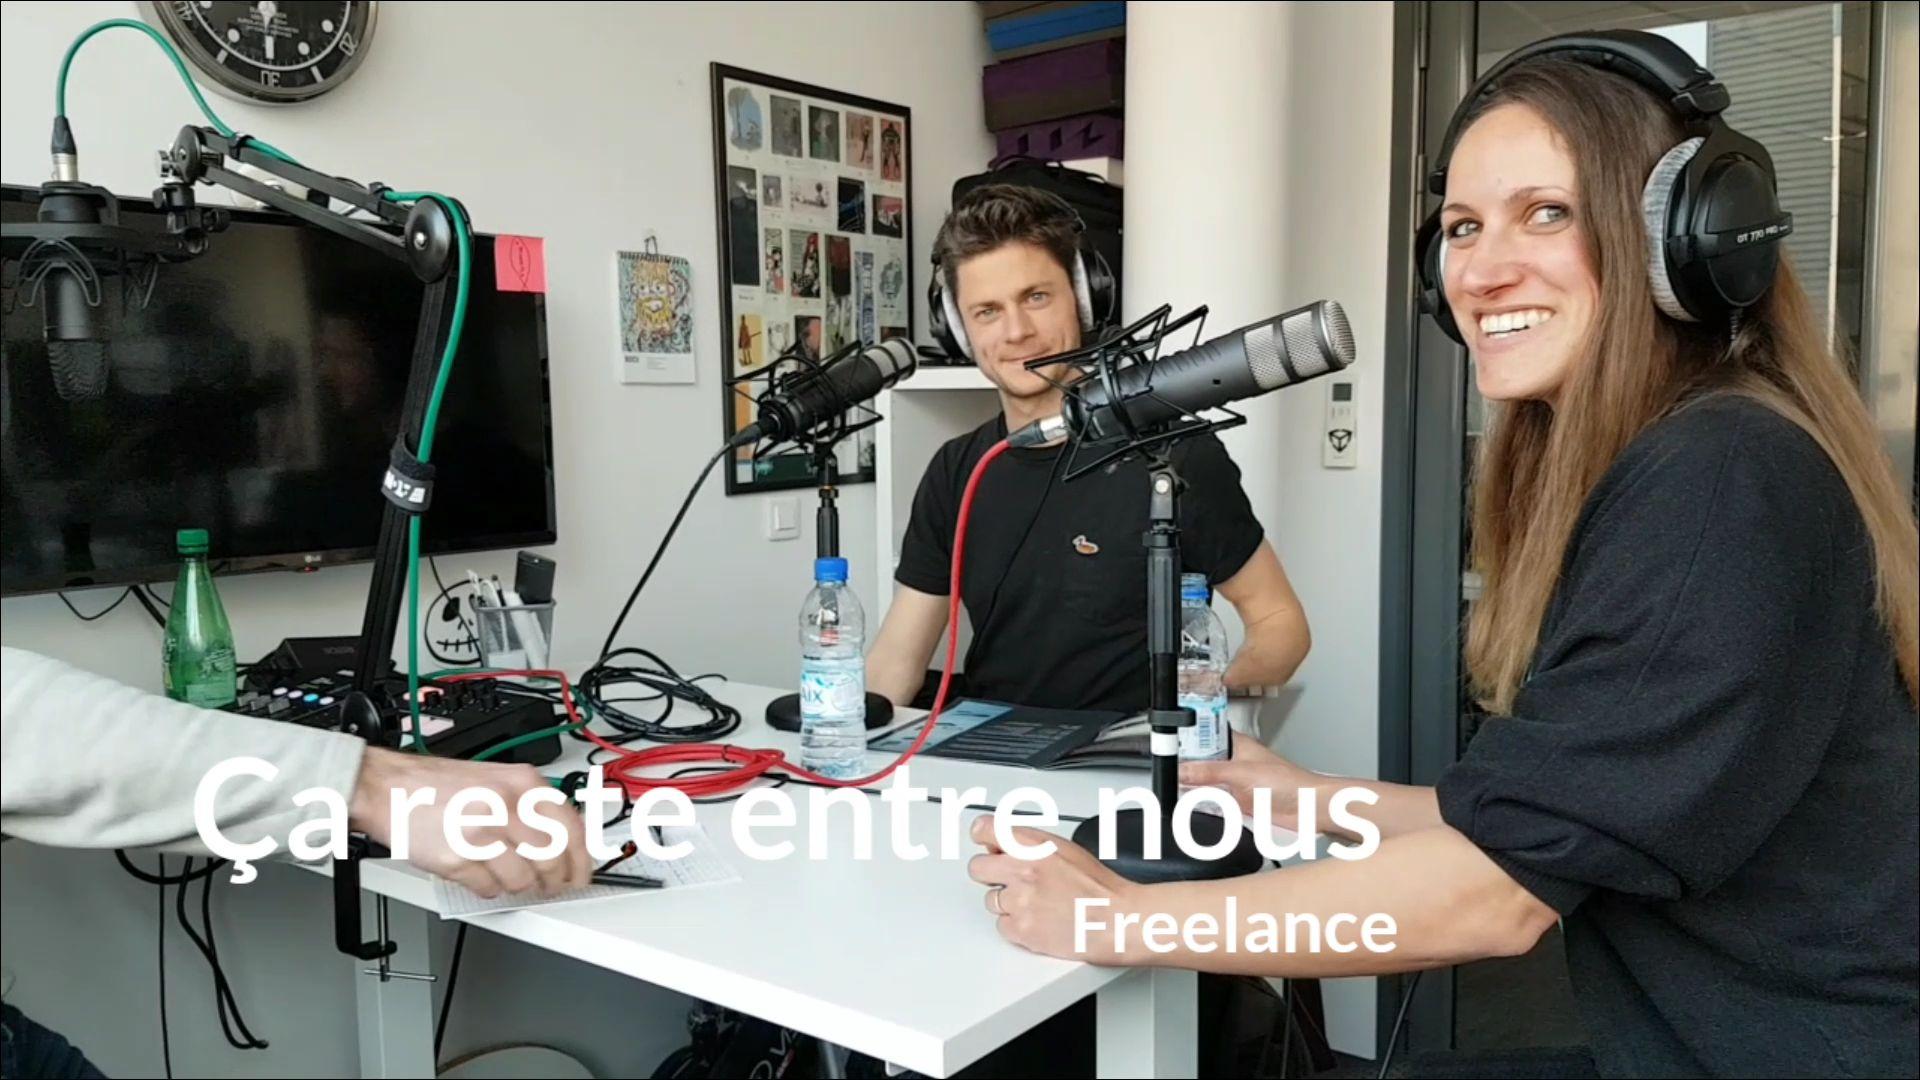 Podcast freelance digital learning